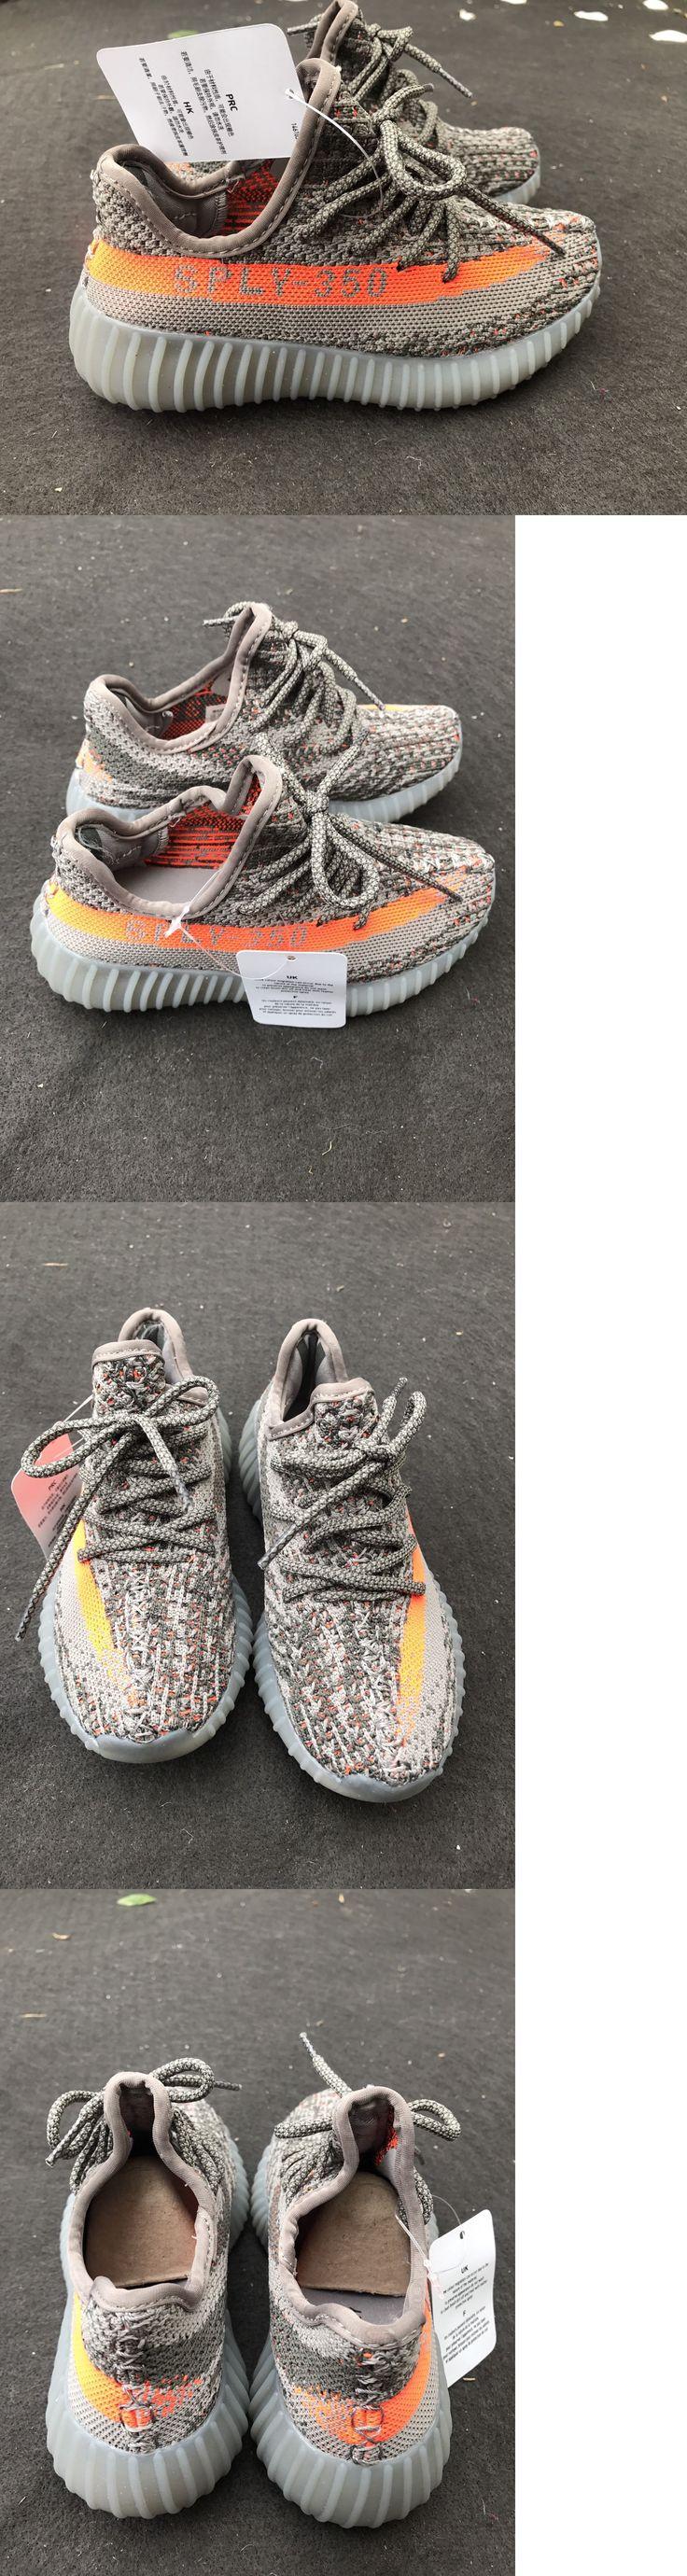 Infant Shoes: Custom 350 Beluga V2 Toddler Kids Baby Yeezy -> BUY IT NOW ONLY: $85 on eBay!